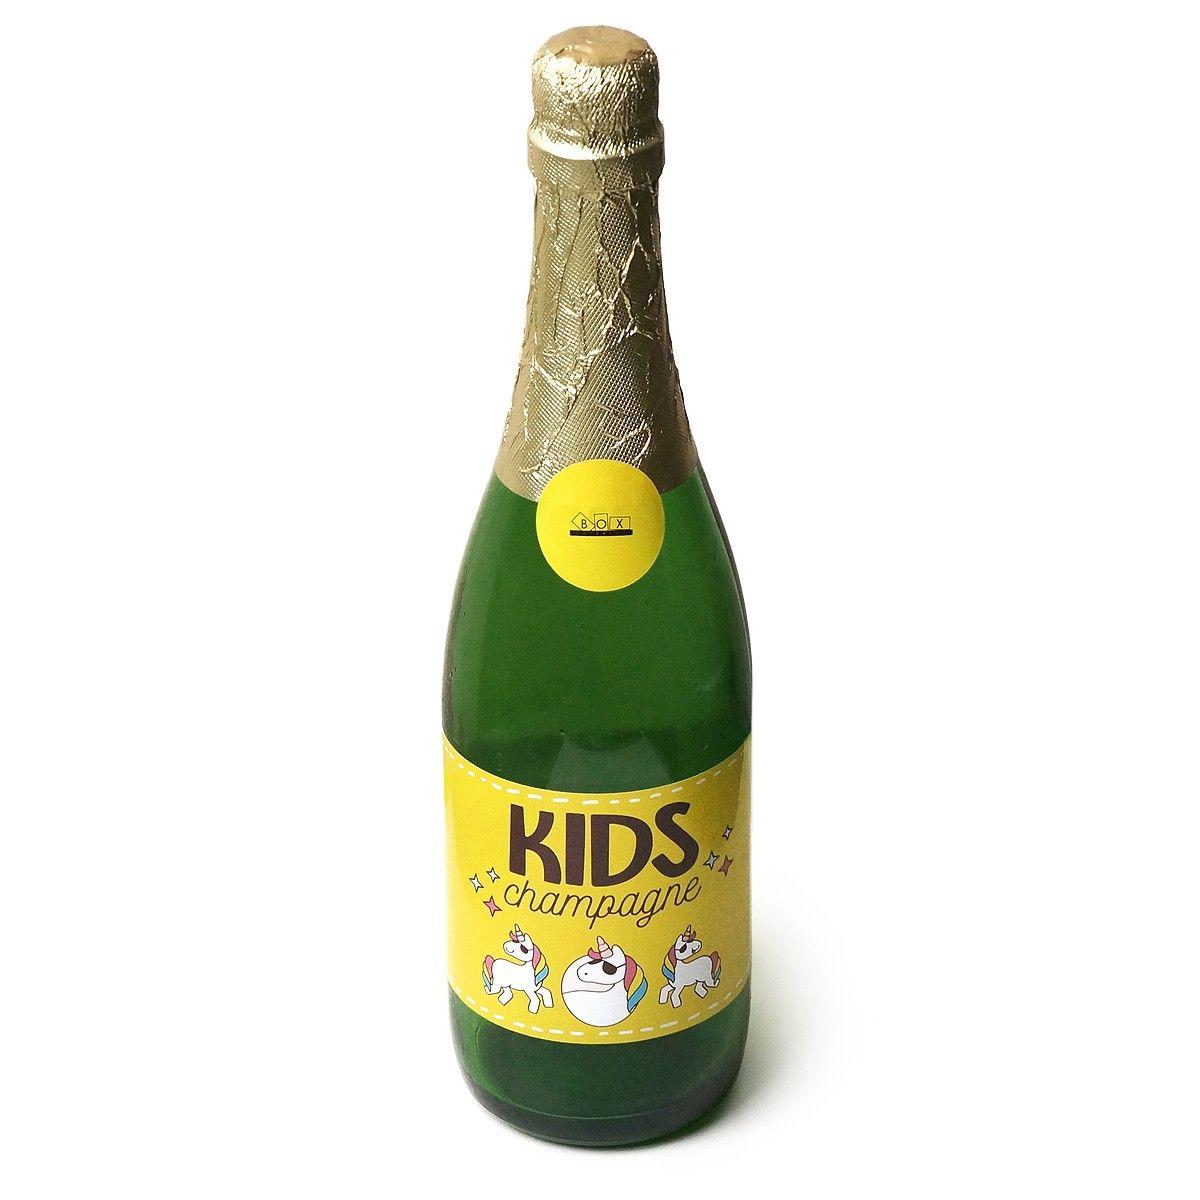 Kids champagne фото 1